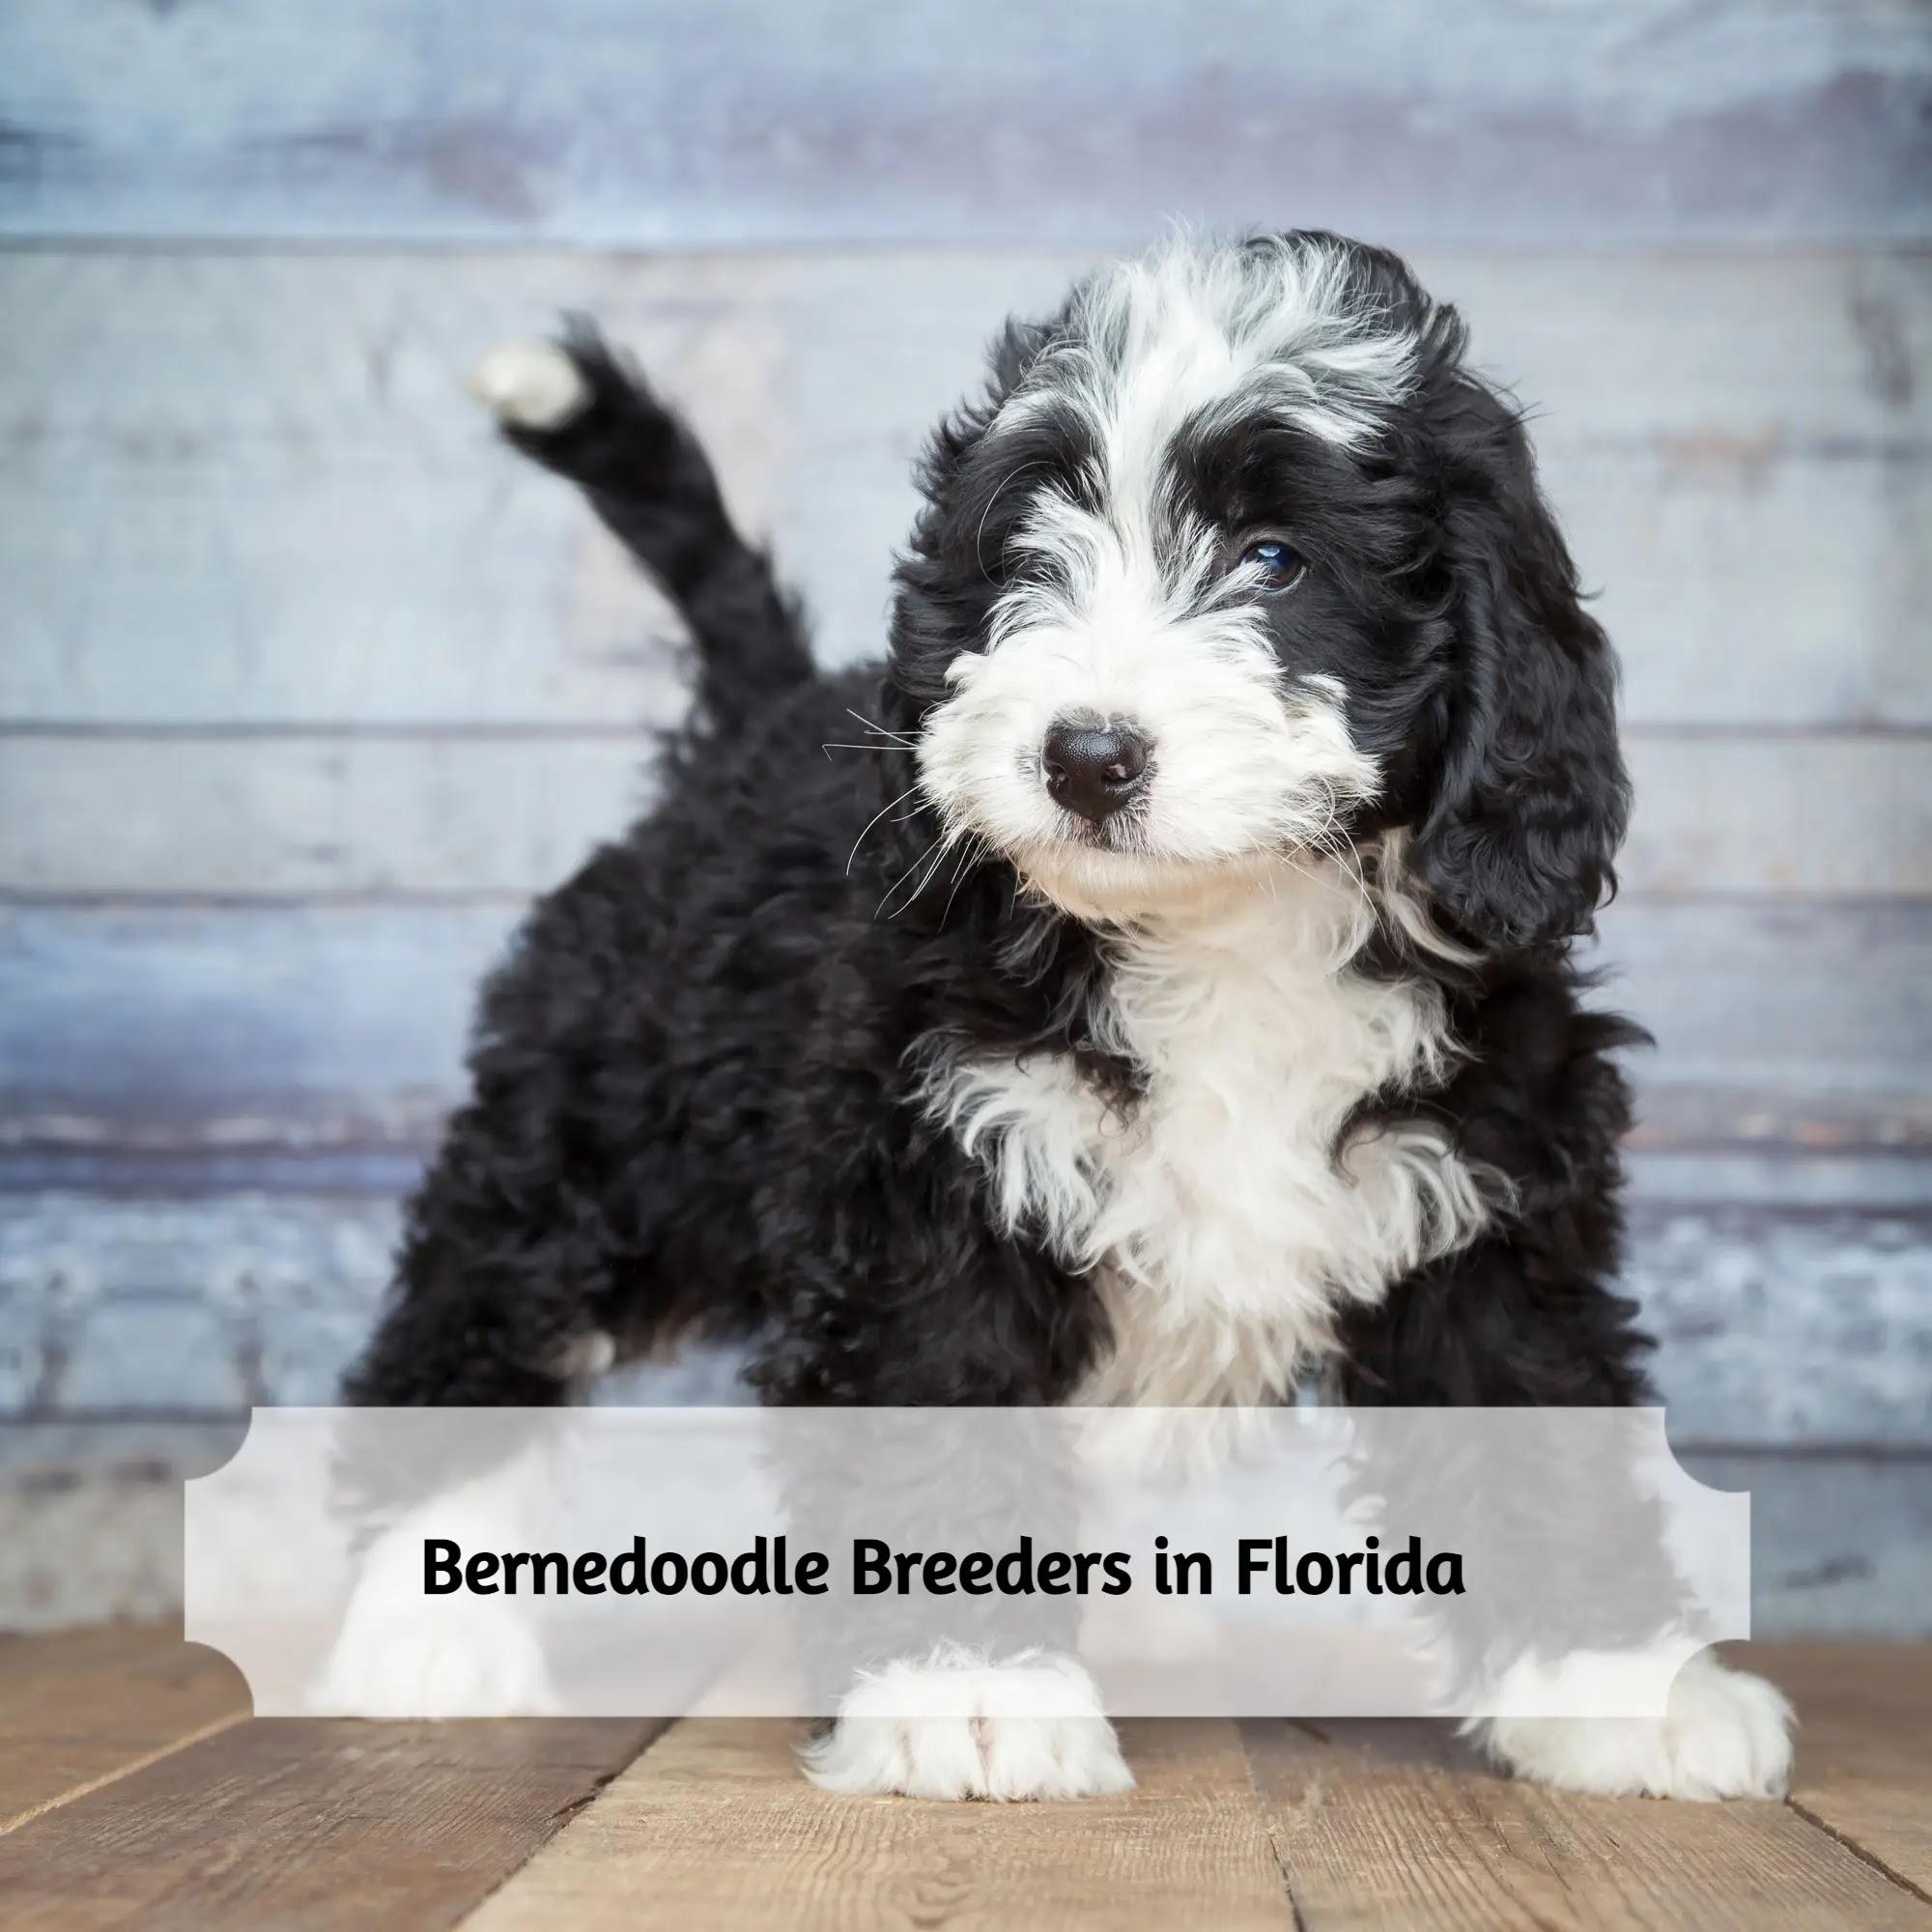 Bernedoodle-Breeders-in-florida